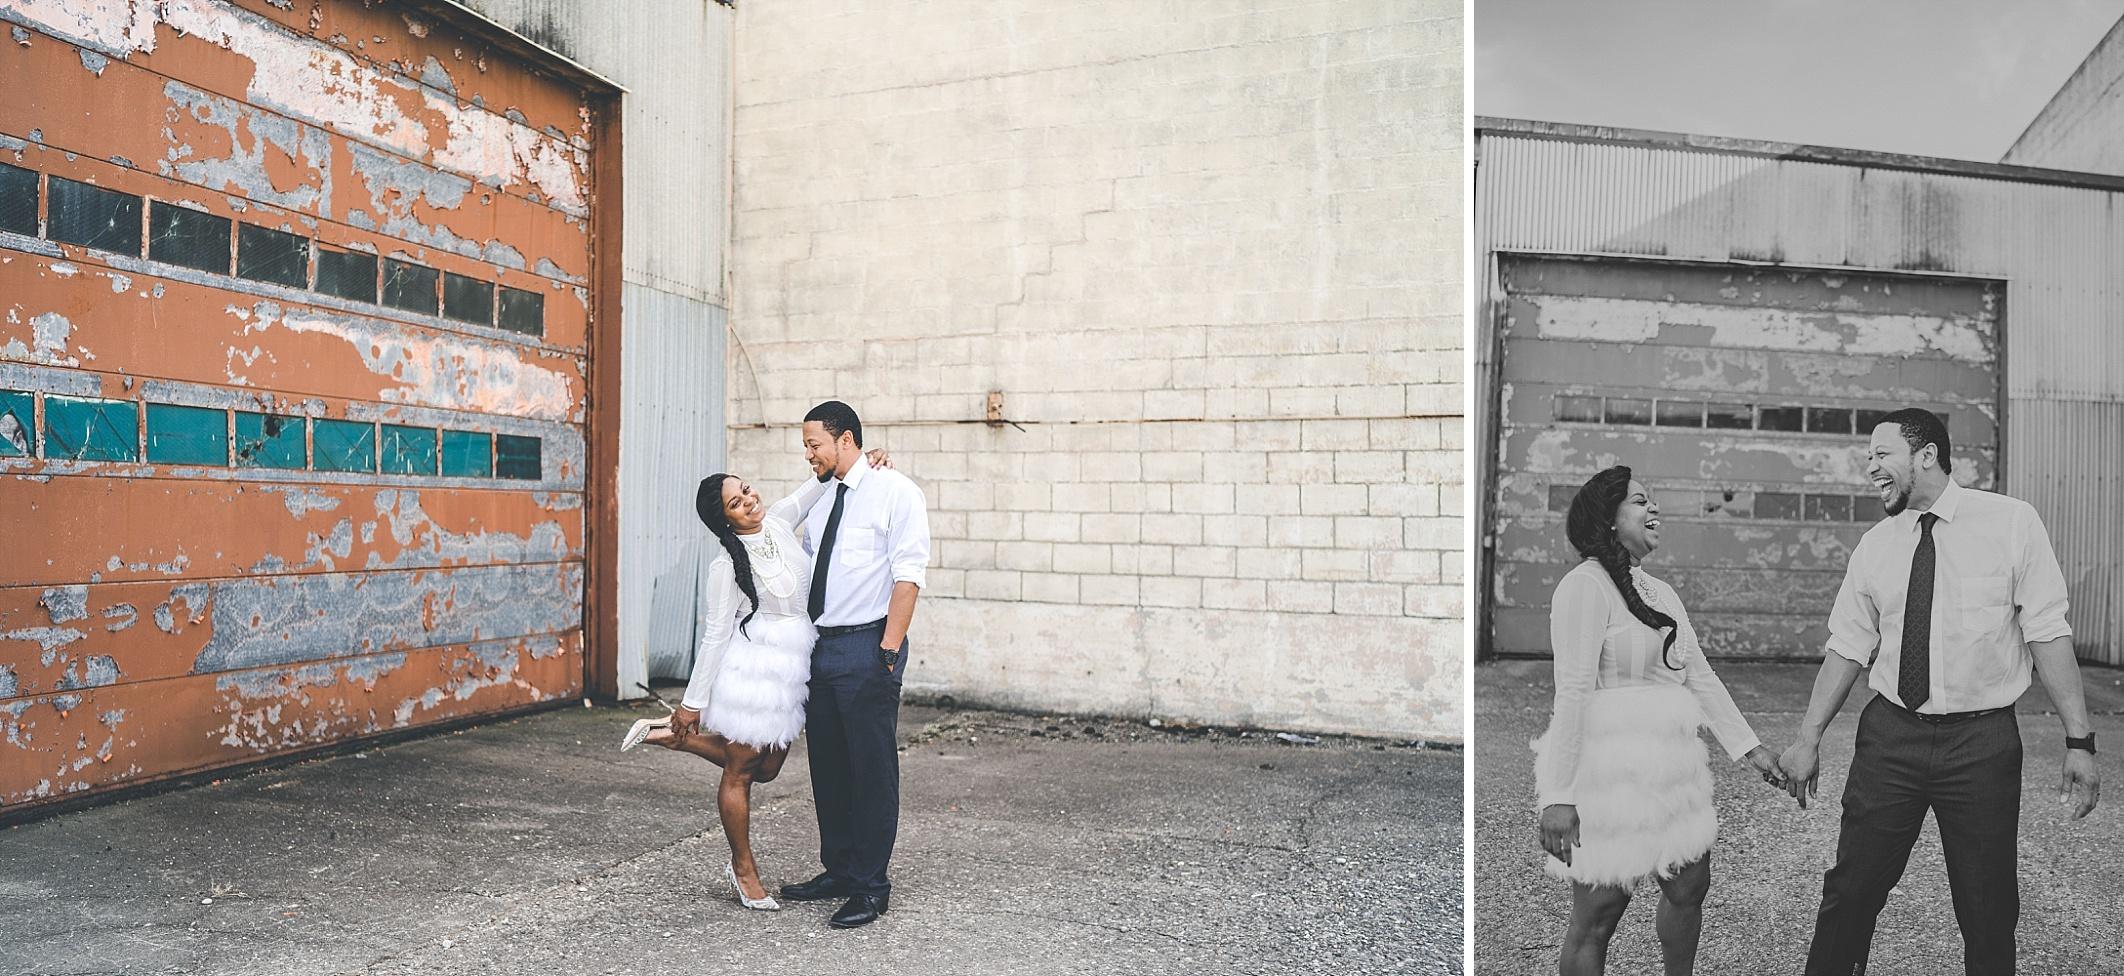 002-dayton-photographer-engagement-urban.jpg